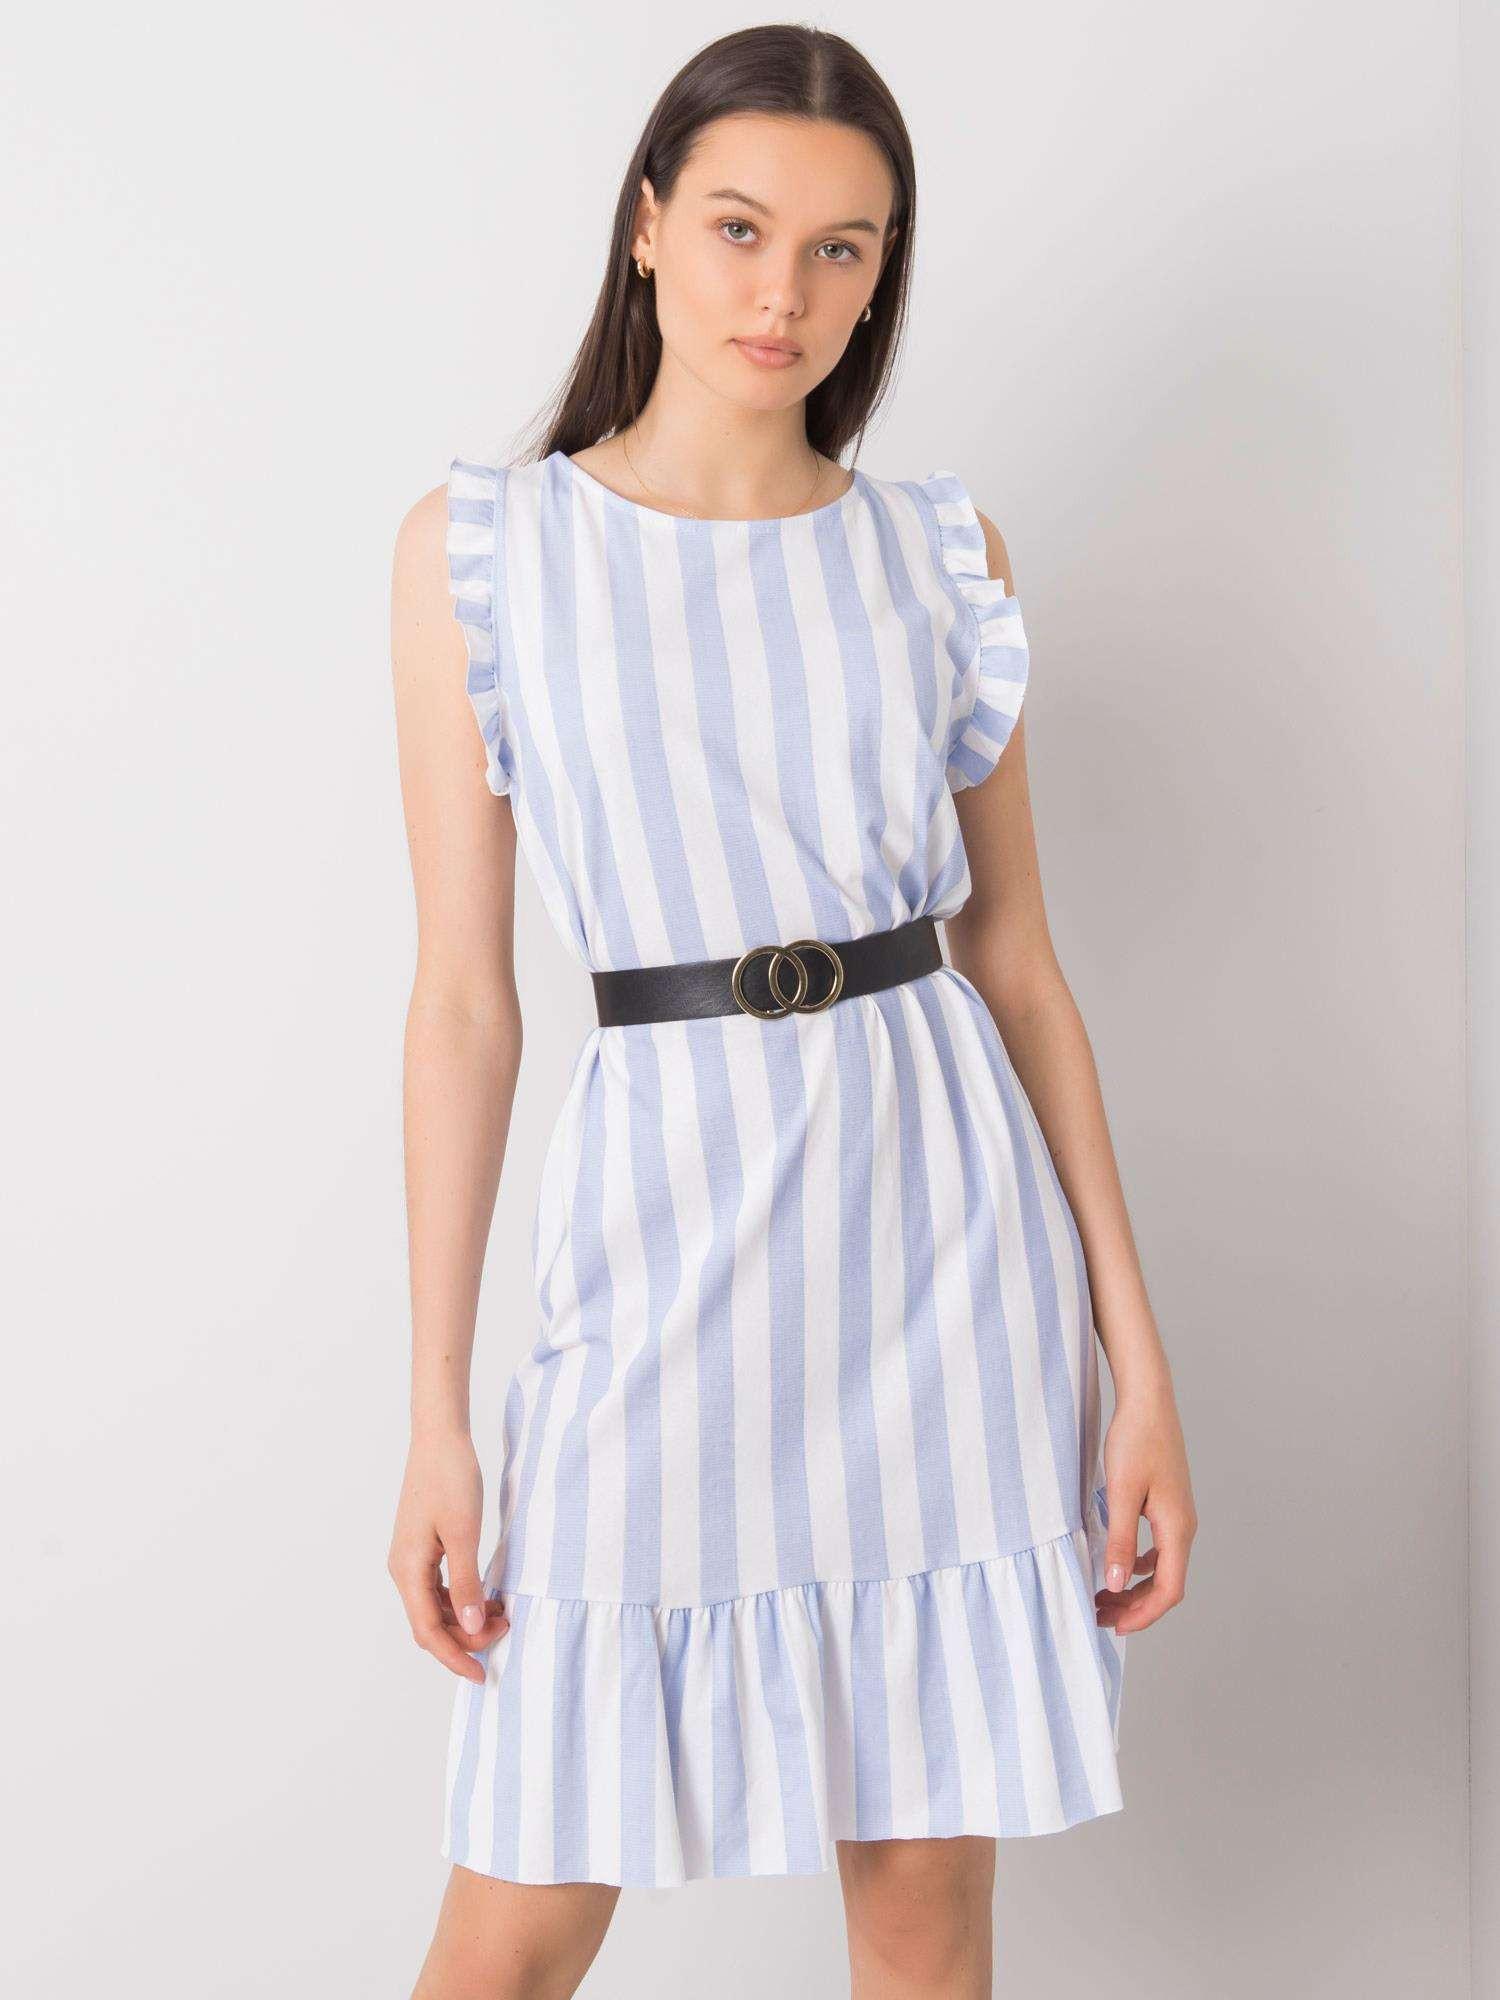 Svetlo modré pruhované šaty s volánikmi jedna velikost